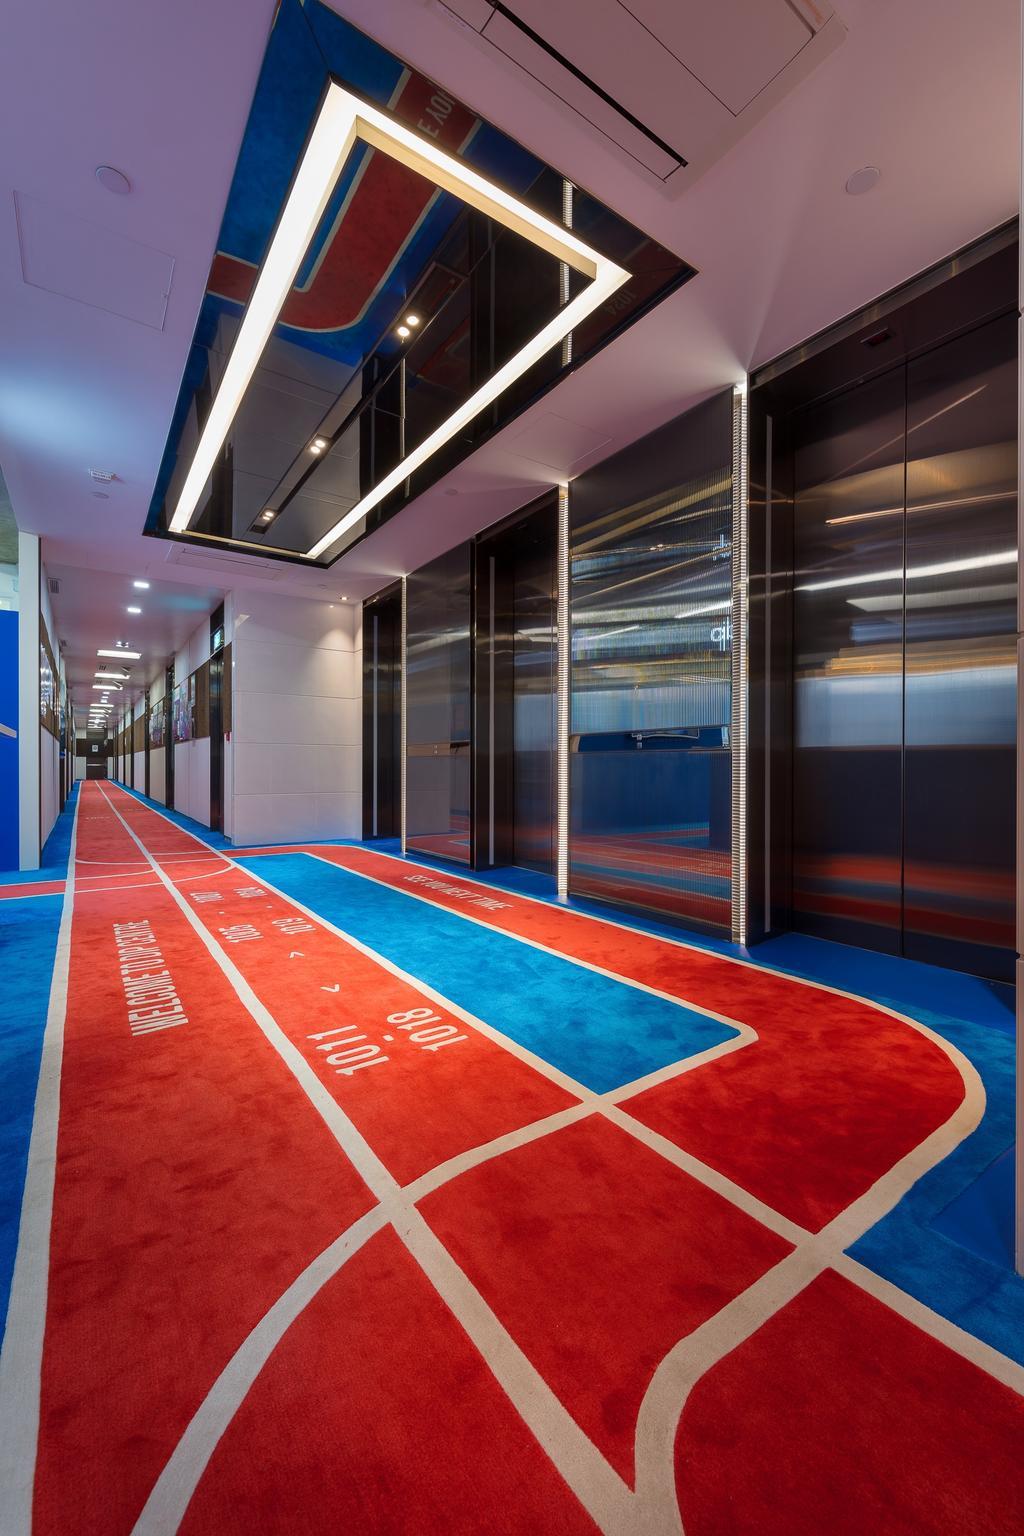 HK DIP Program, 商用, 室內設計師, Krispace Design Consultancy, 摩登, 復古, Corridor